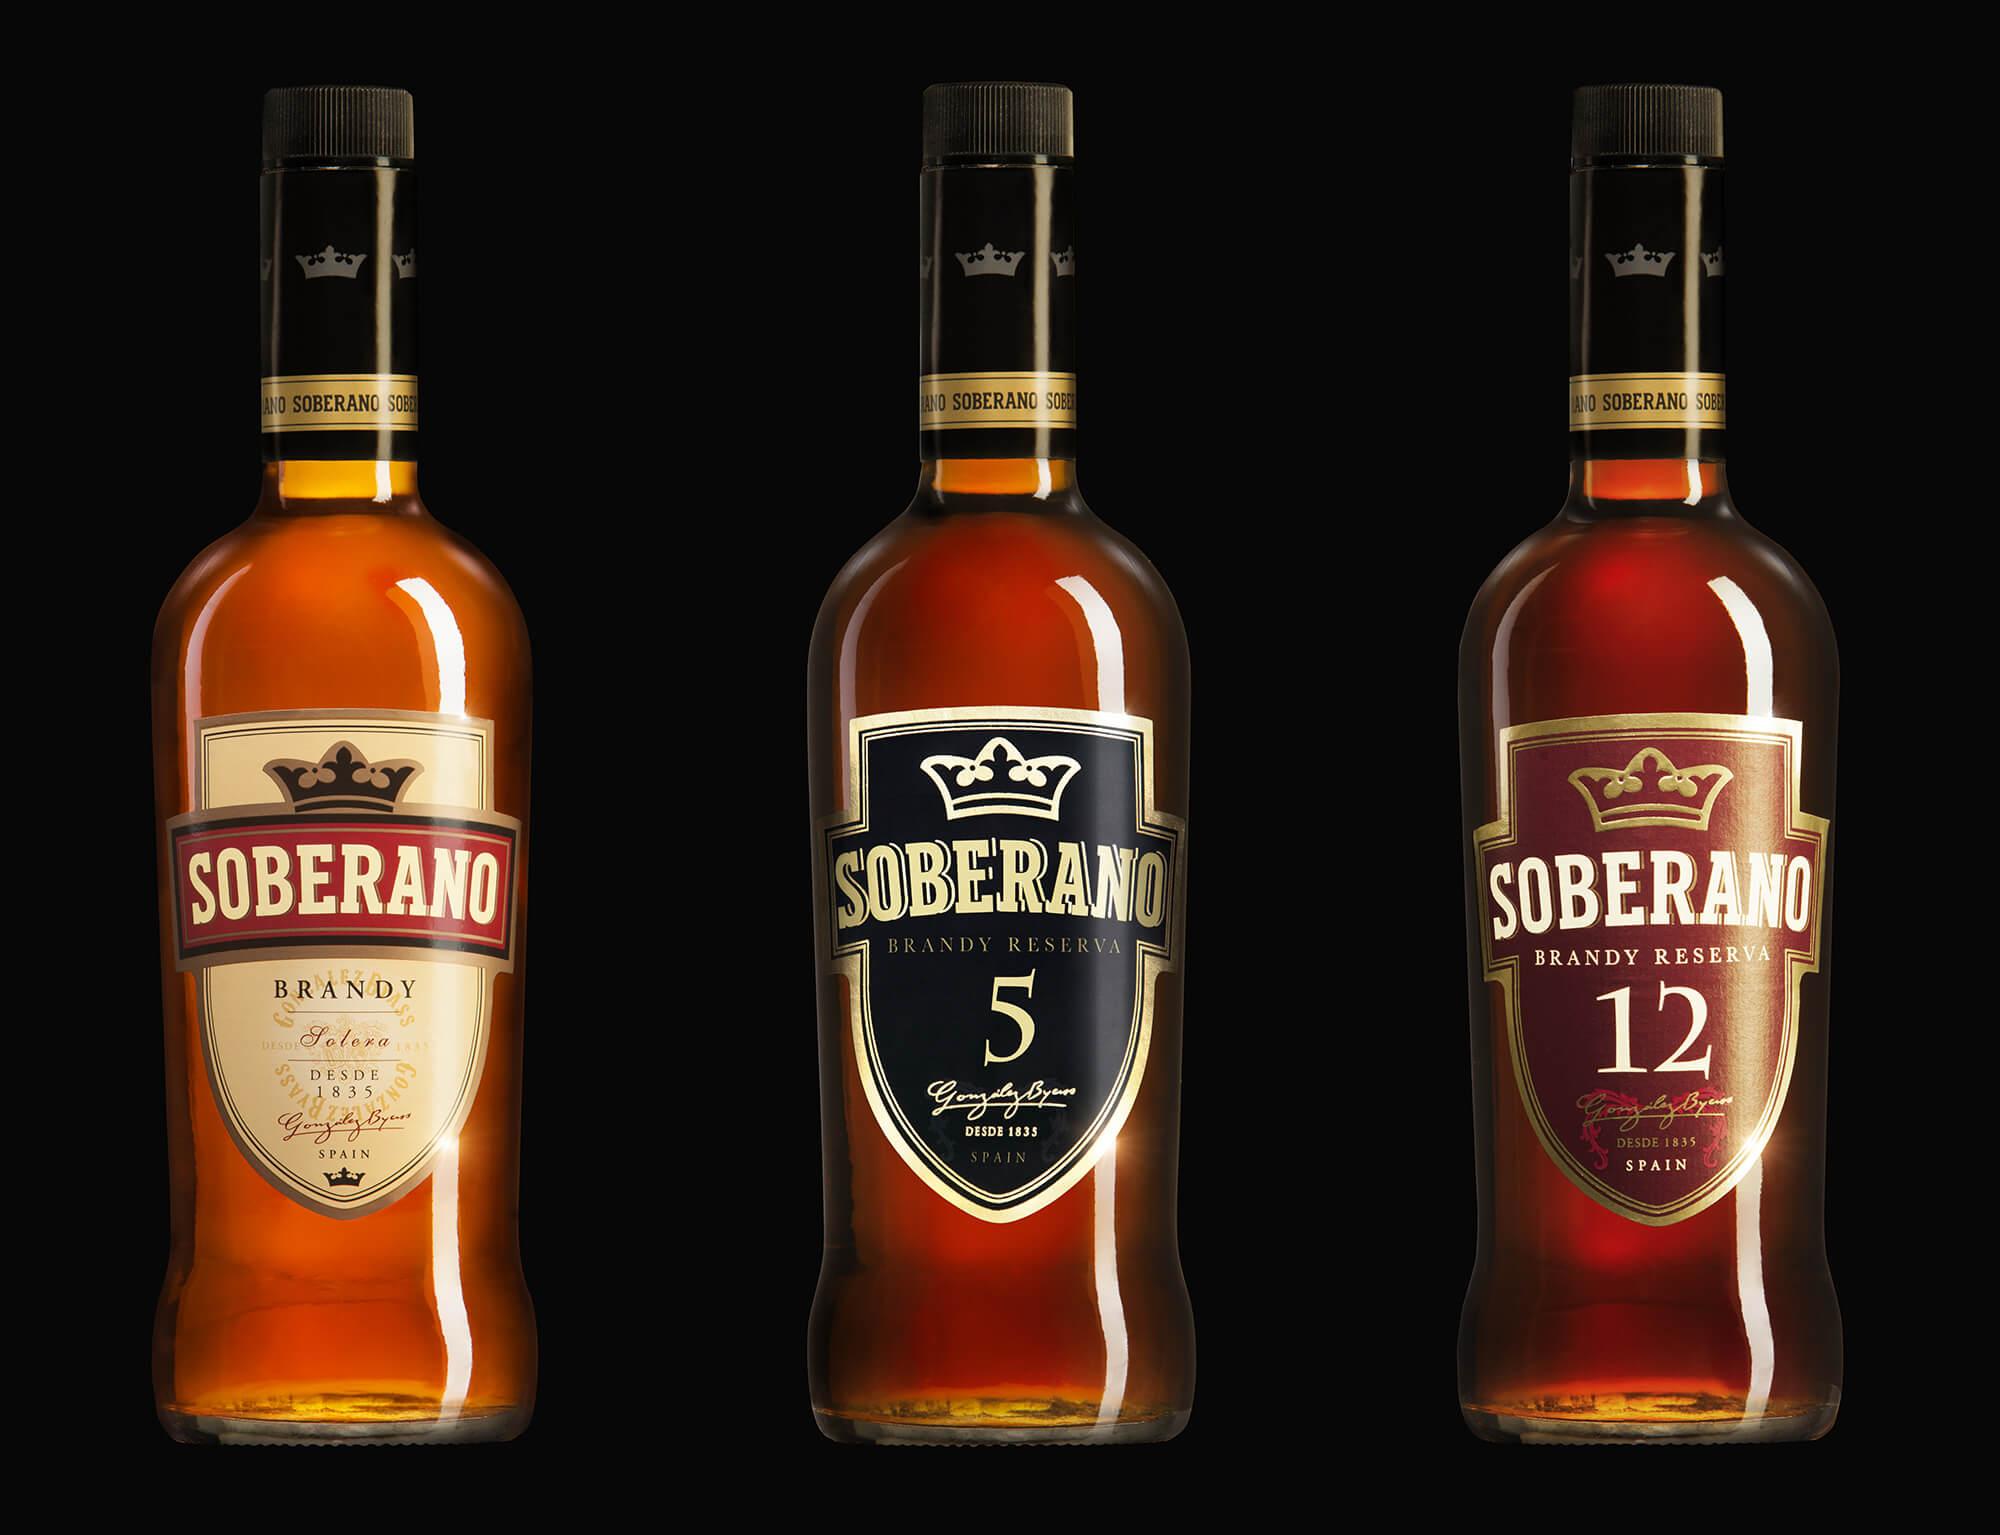 soberano bottles